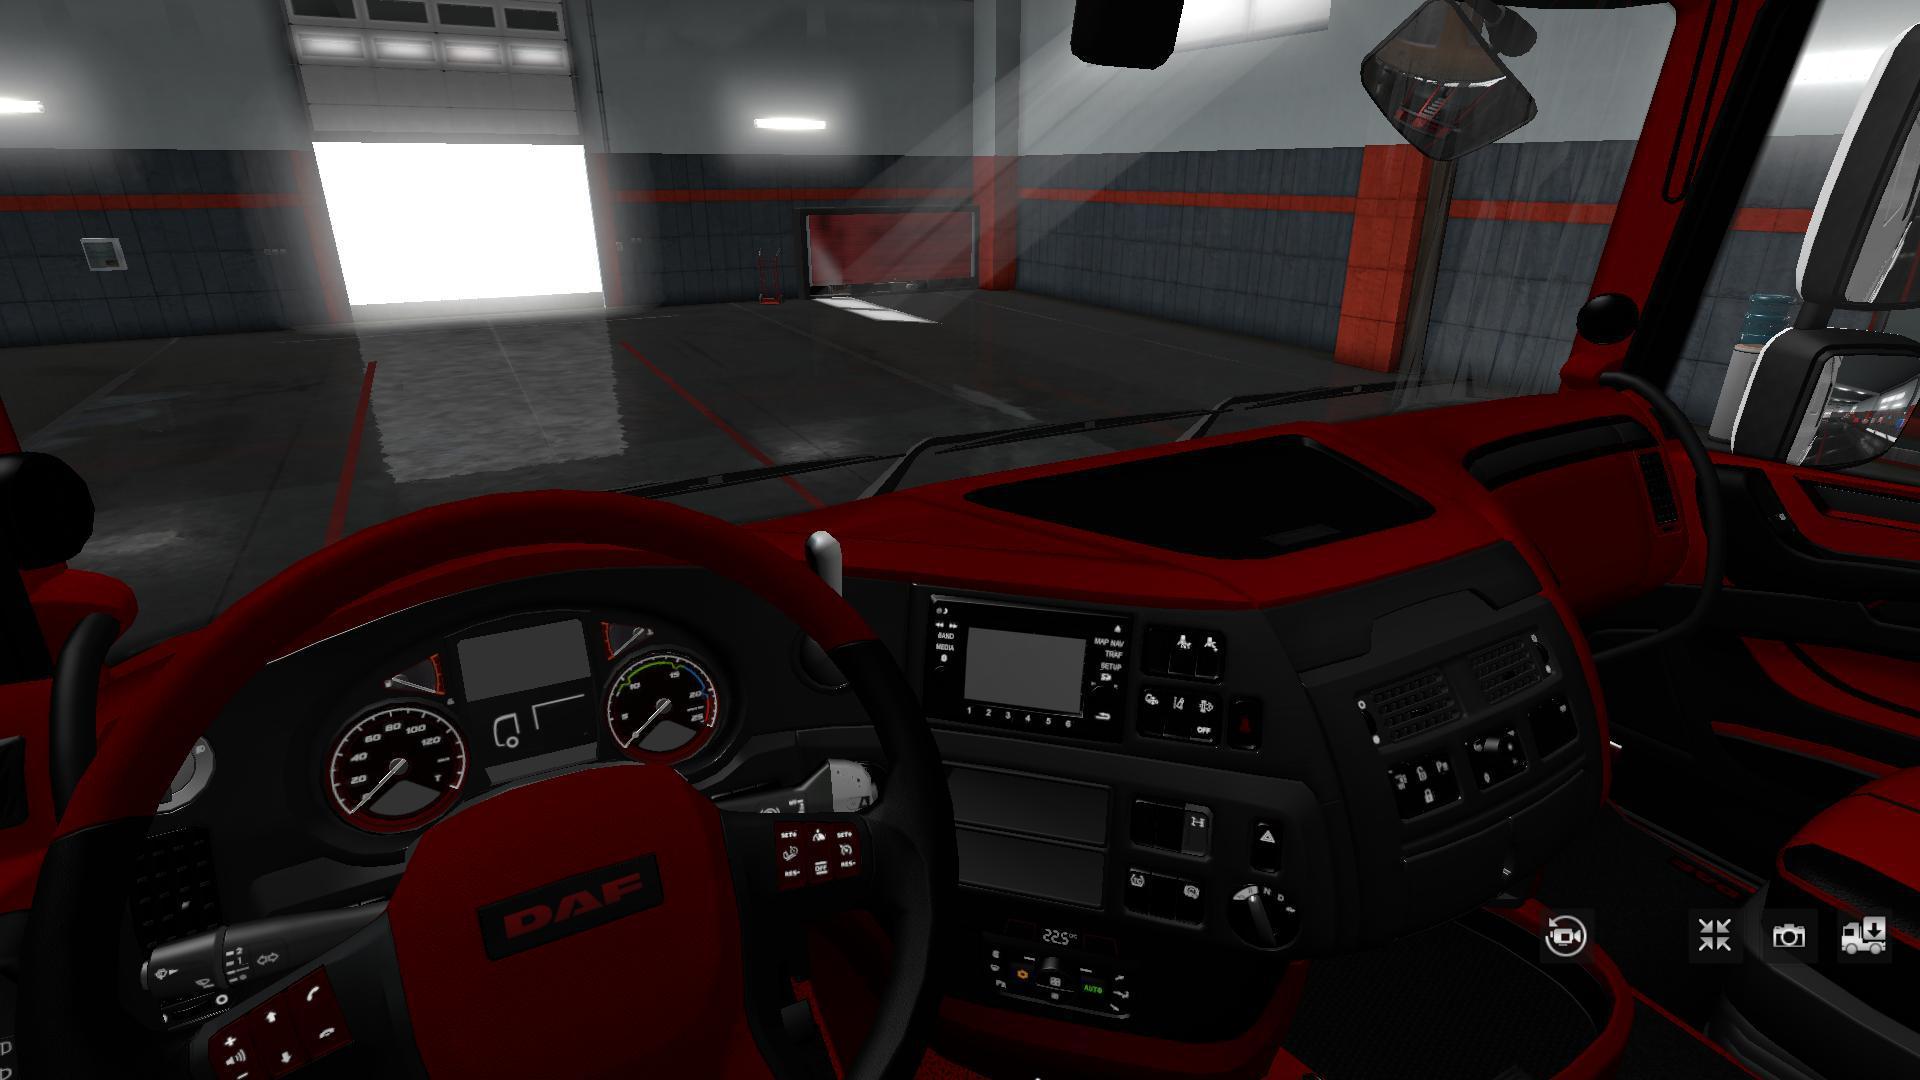 ETS2 - Daf Xf 106 Red-Black Exclusive Interior V1.0 (1.35.X)